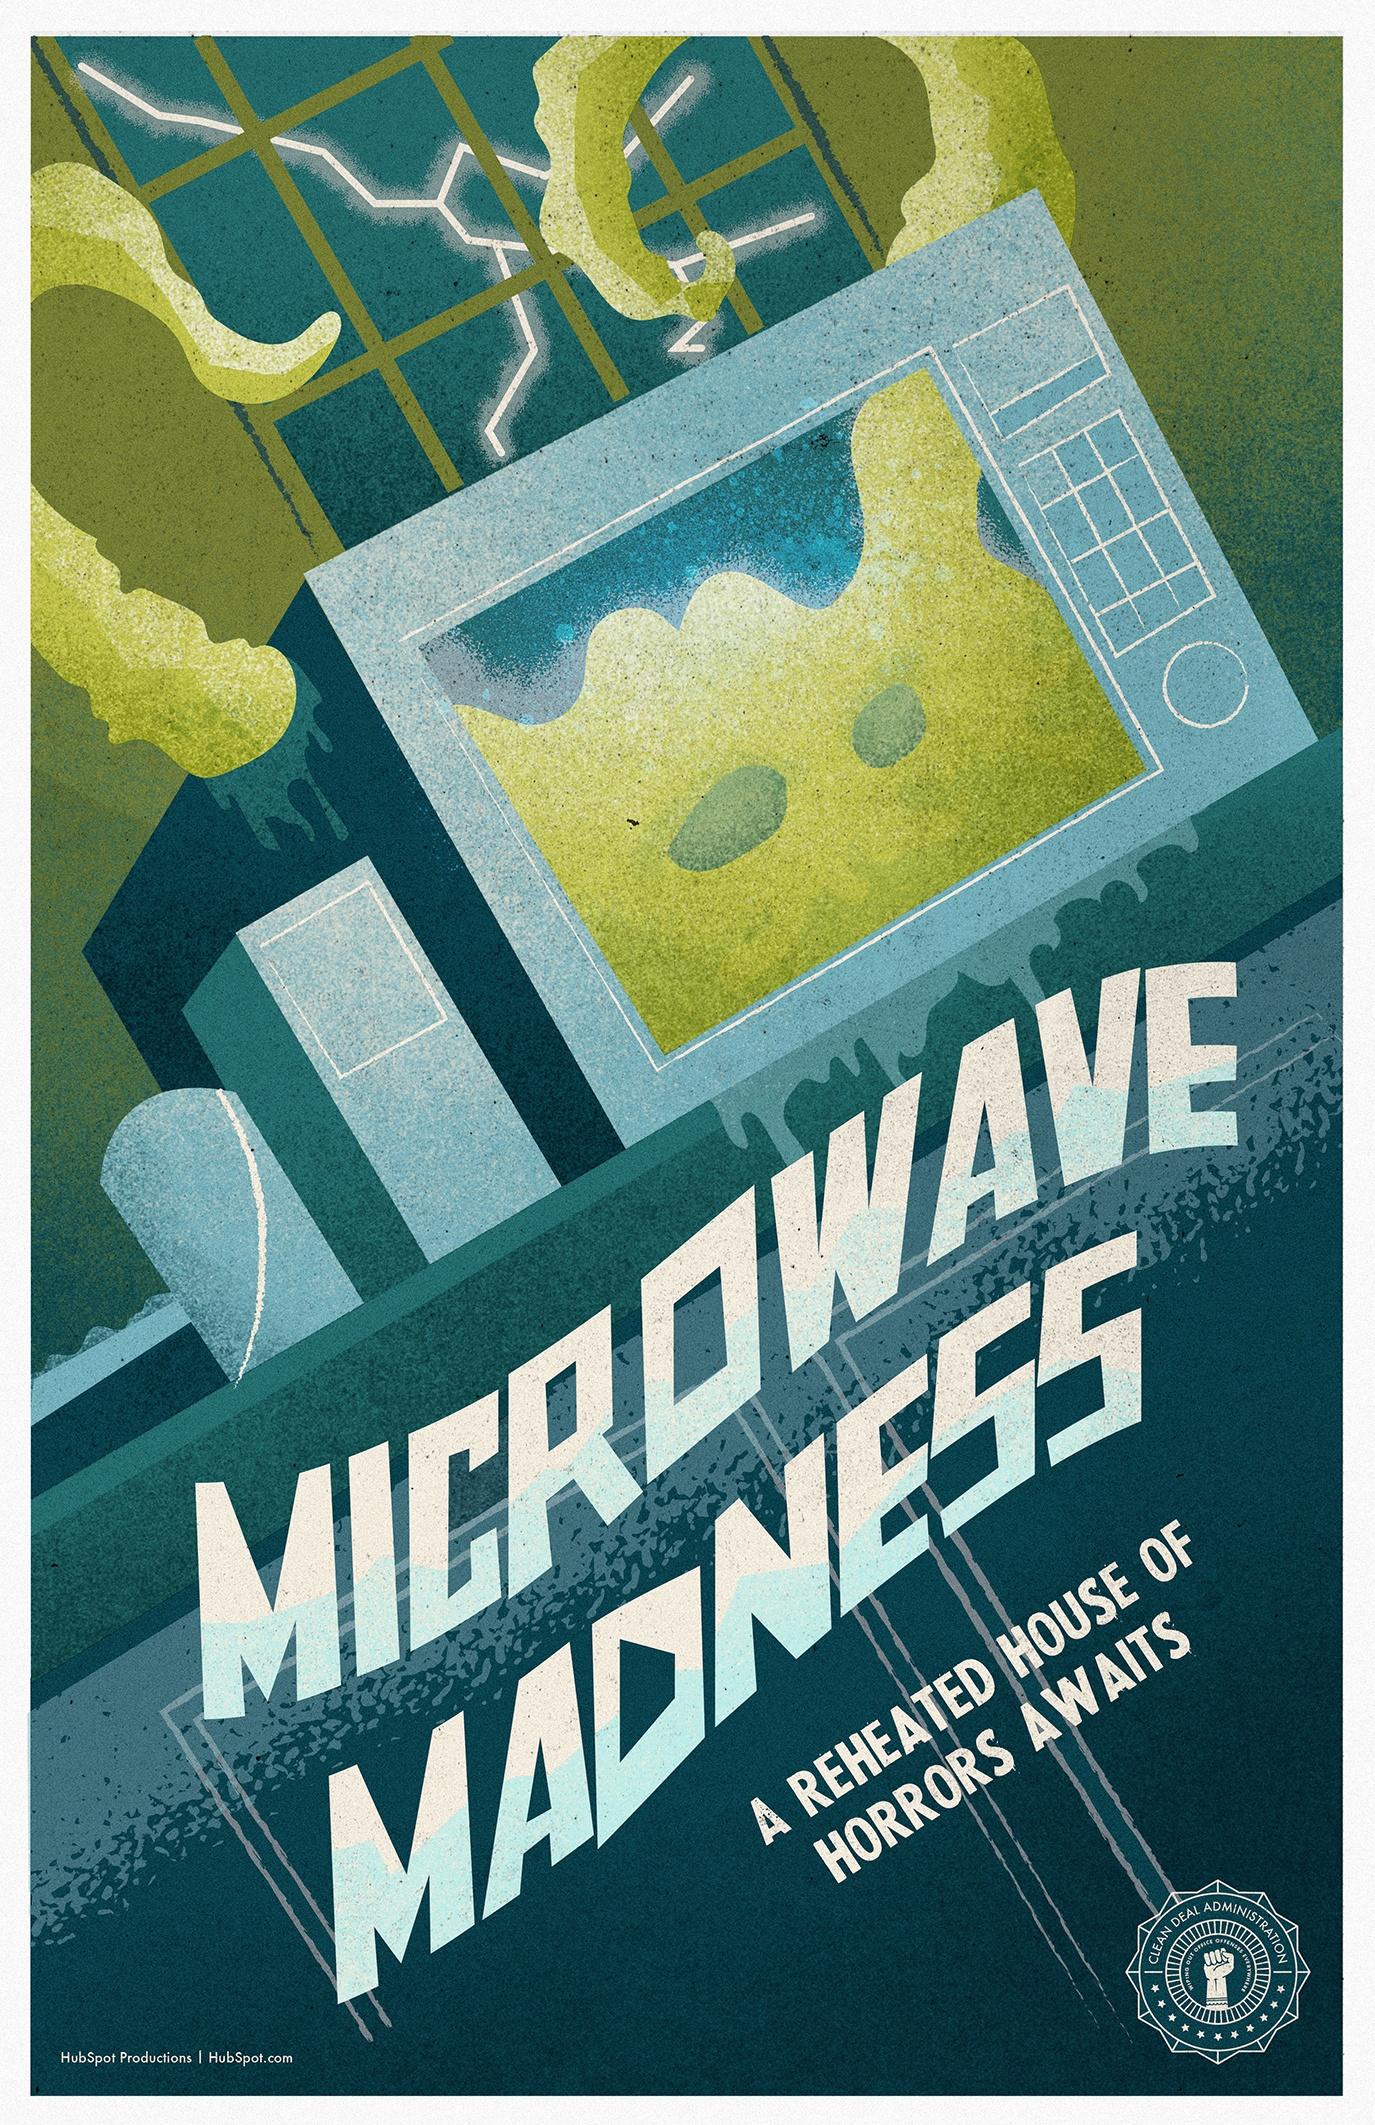 CDA_microwavemadness.jpg